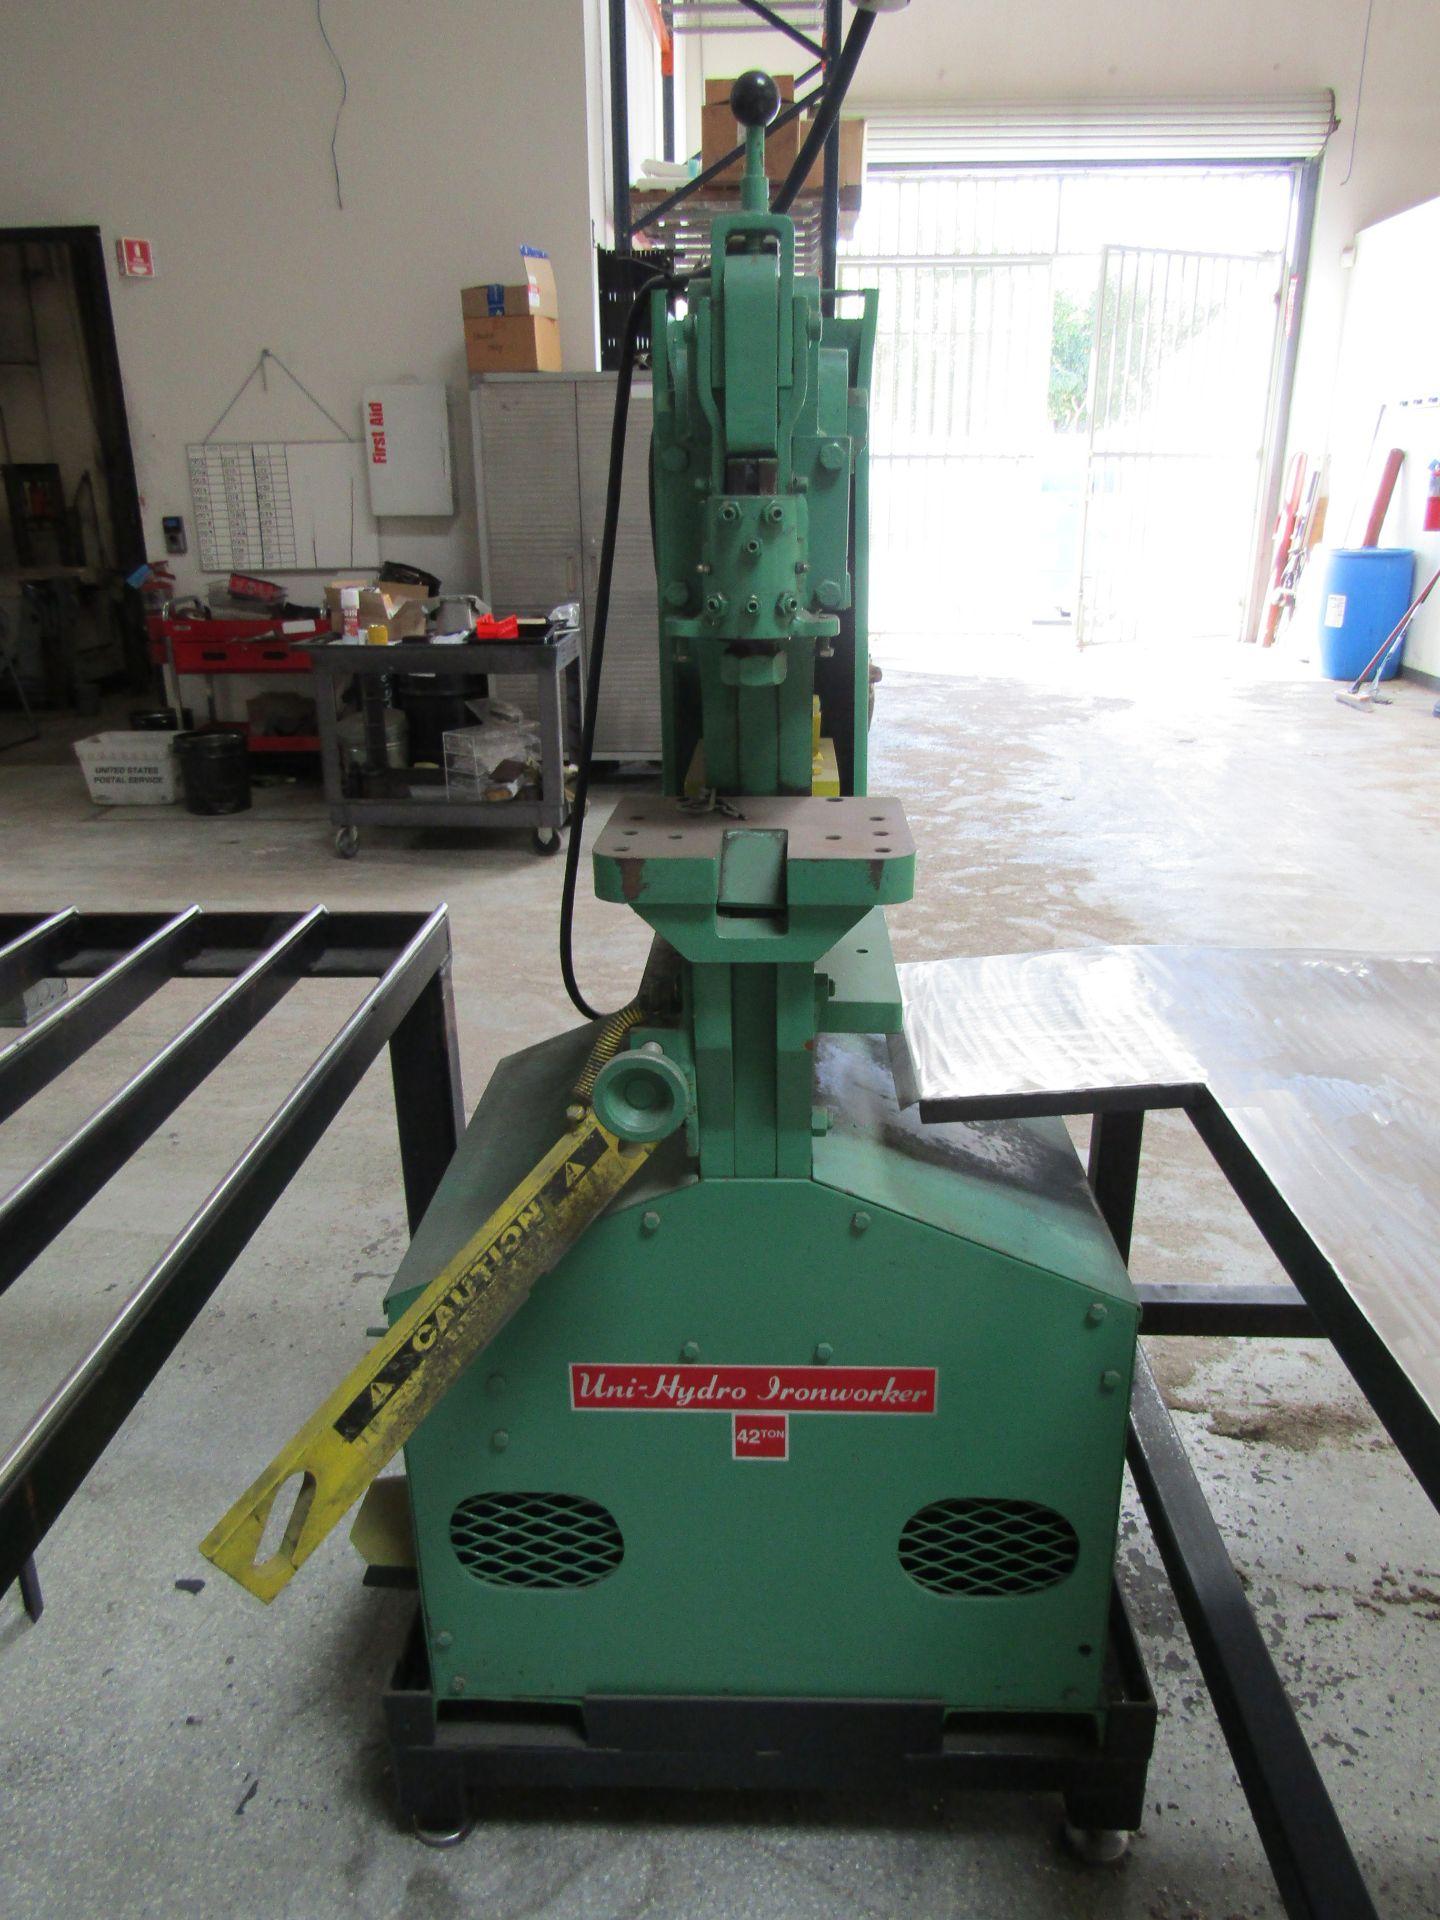 Lot 10 - UNI HYDRO 42-14 Hydraulic Ironworker, 42 Ton, Serial 3P4203X